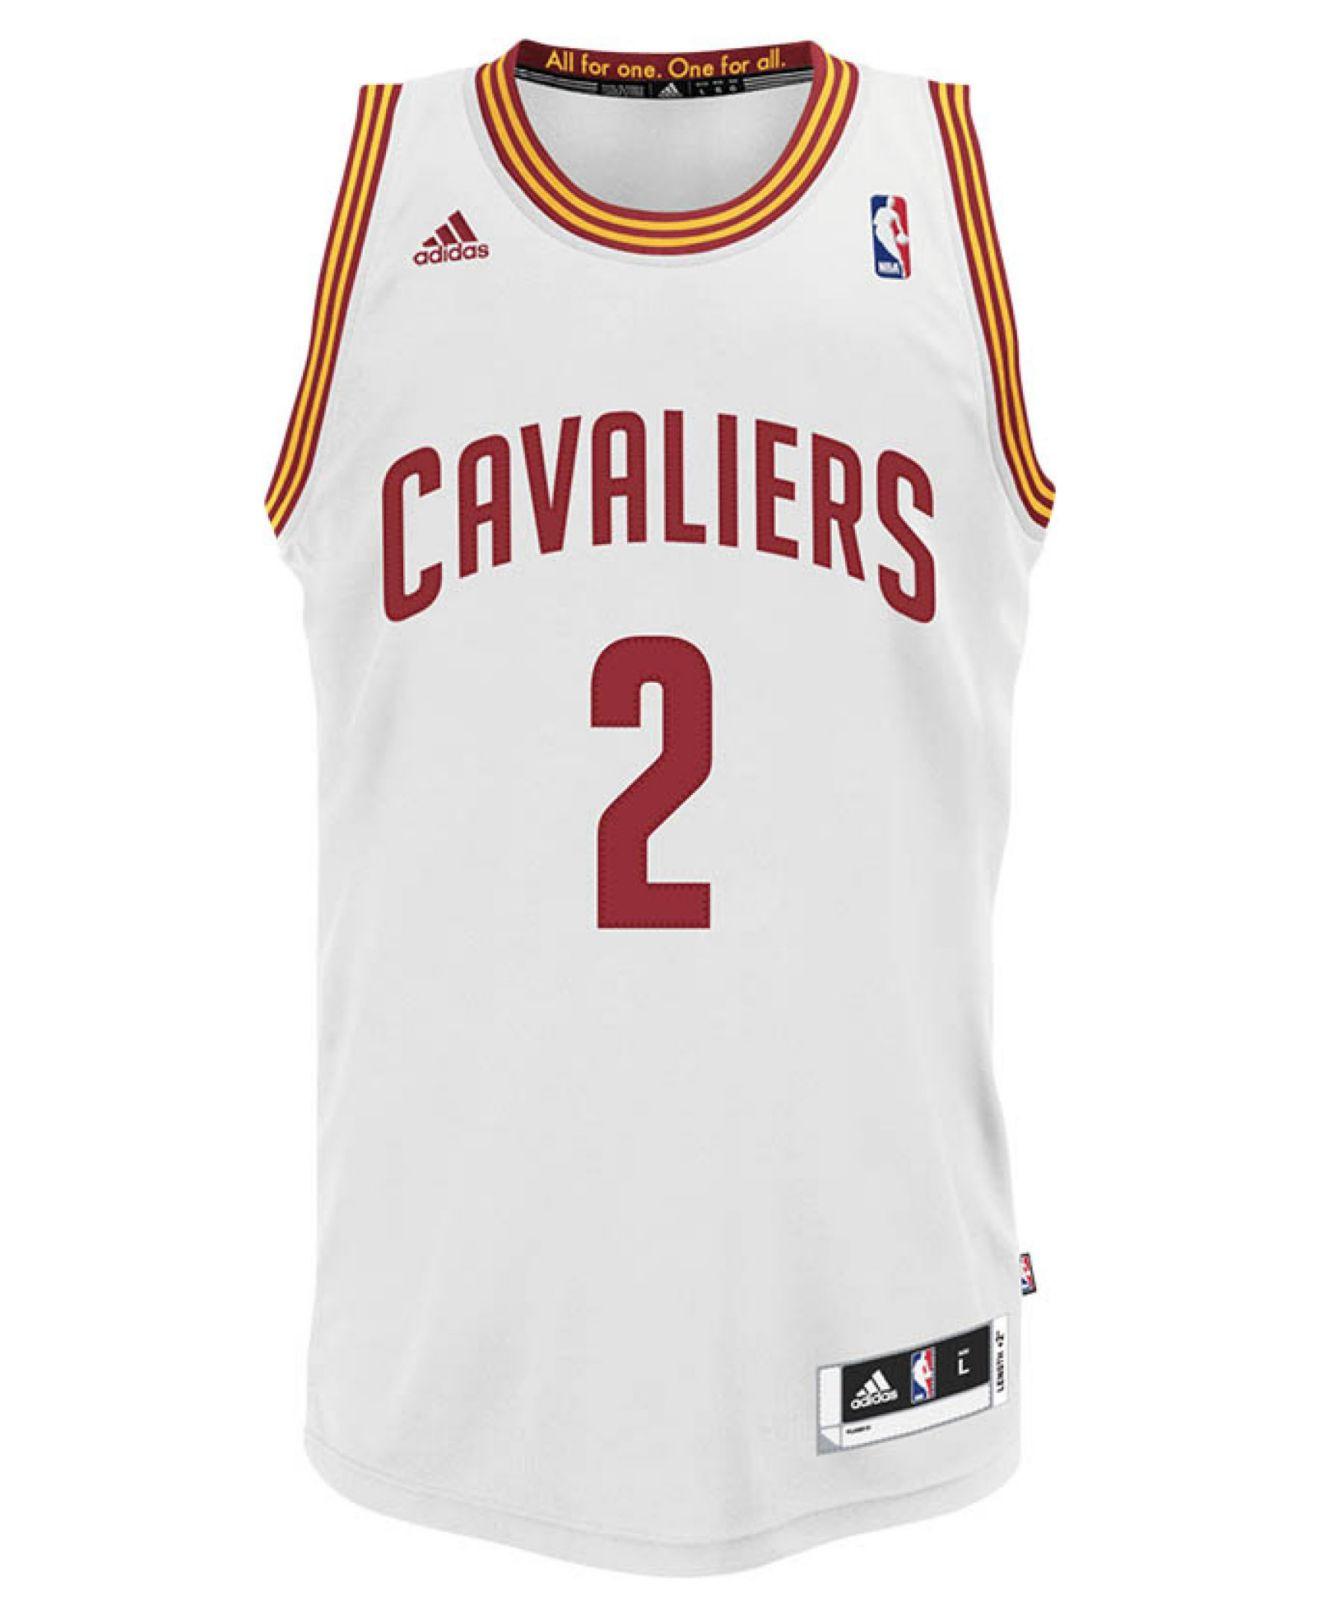 6ea159da0654f2 ... usa lyst adidas mens kyrie irving cleveland cavaliers swingman jersey  d7dd5 18c22